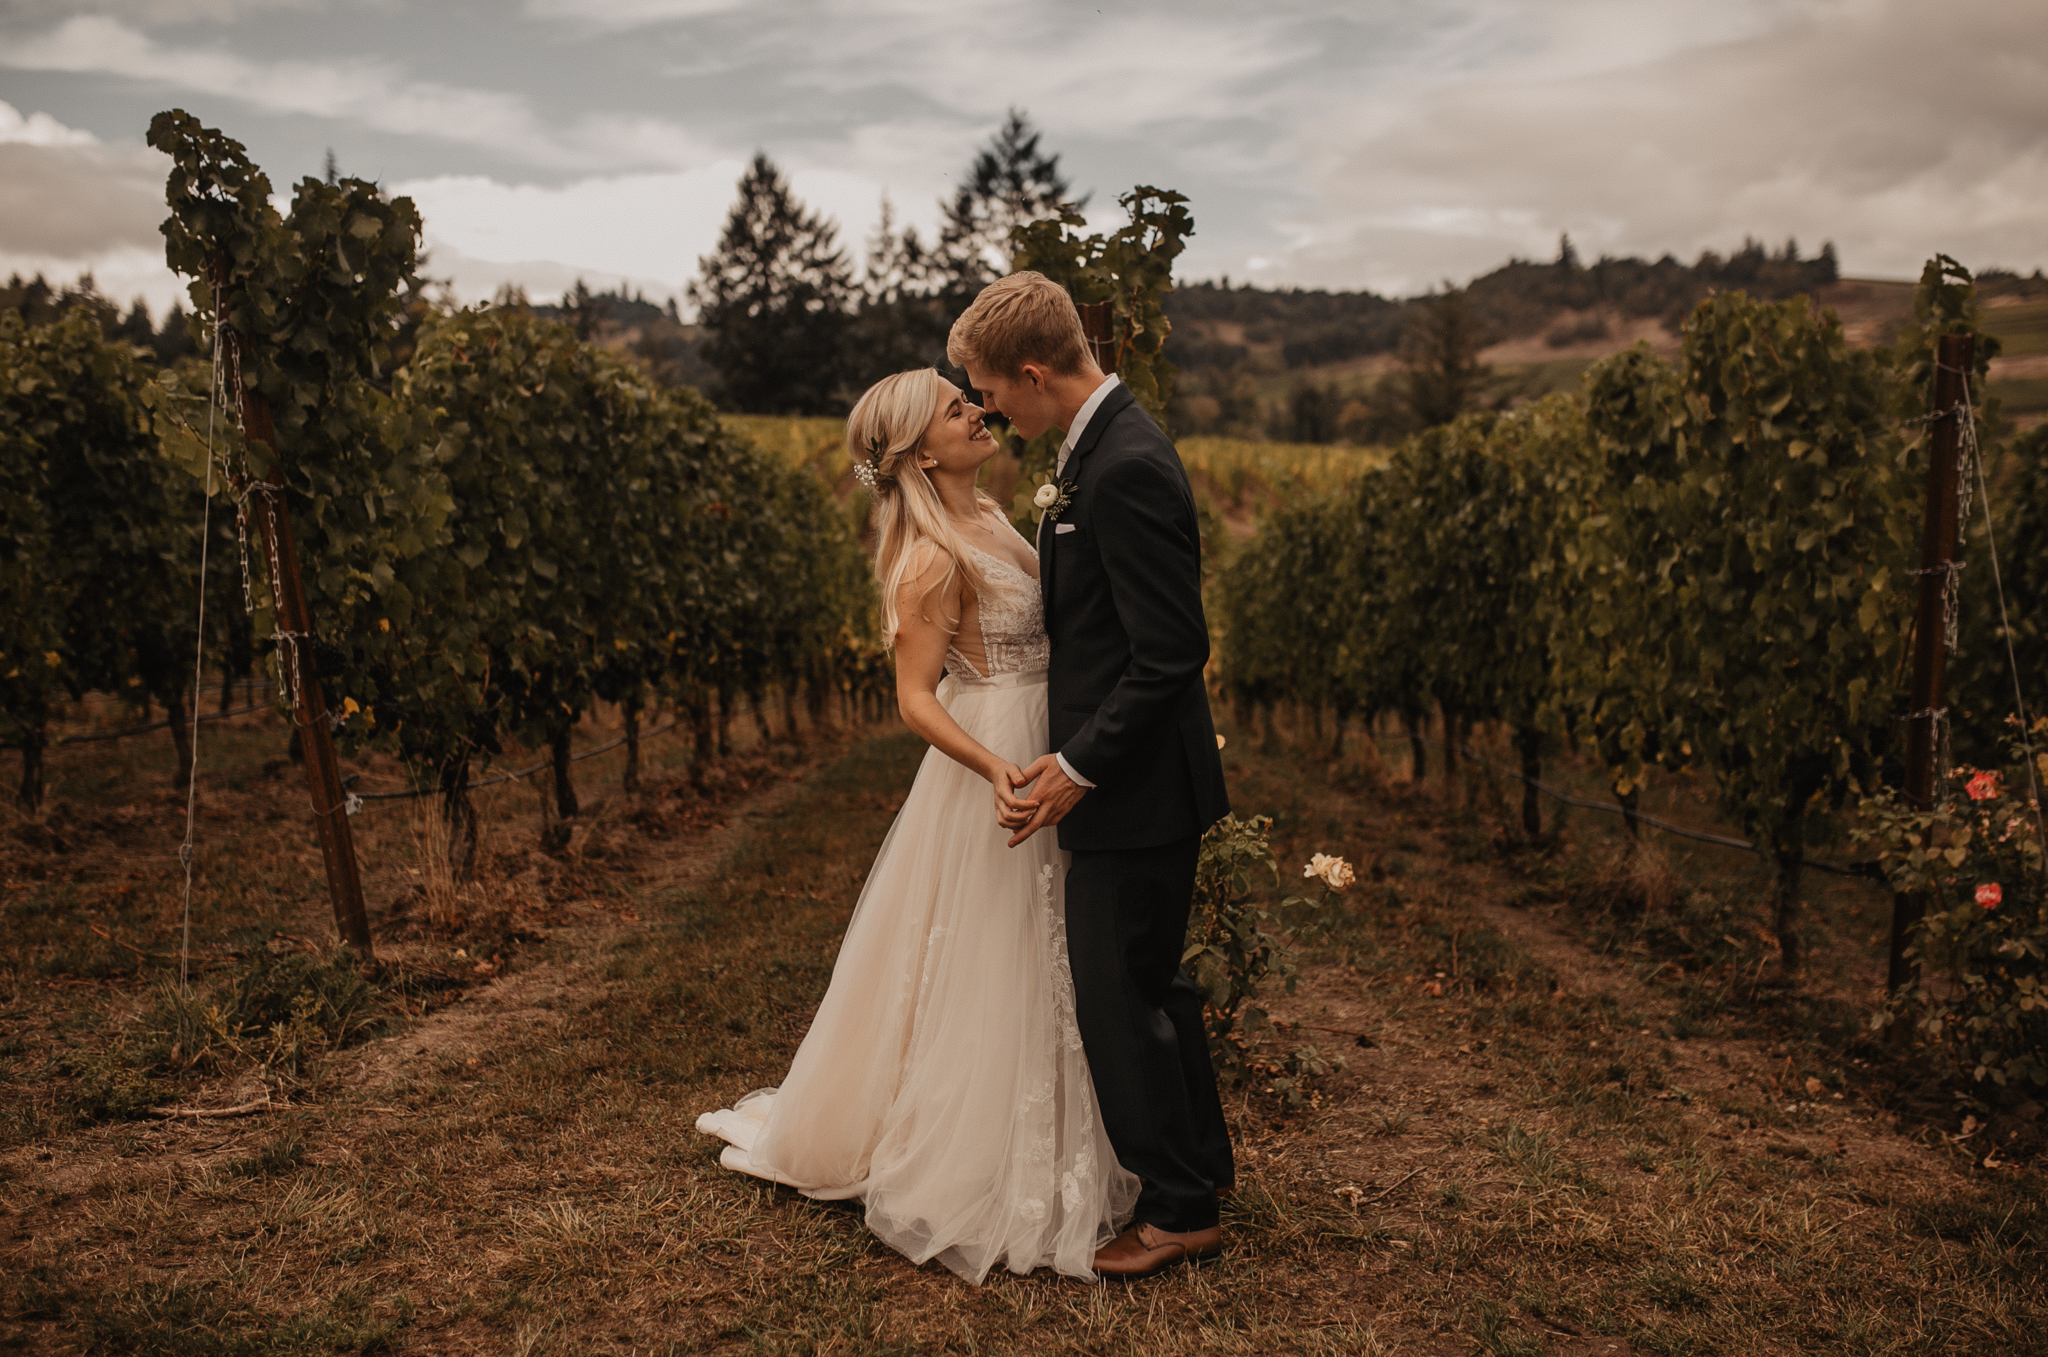 zenith-vineyard-oregon-summer-wedding-255.jpg